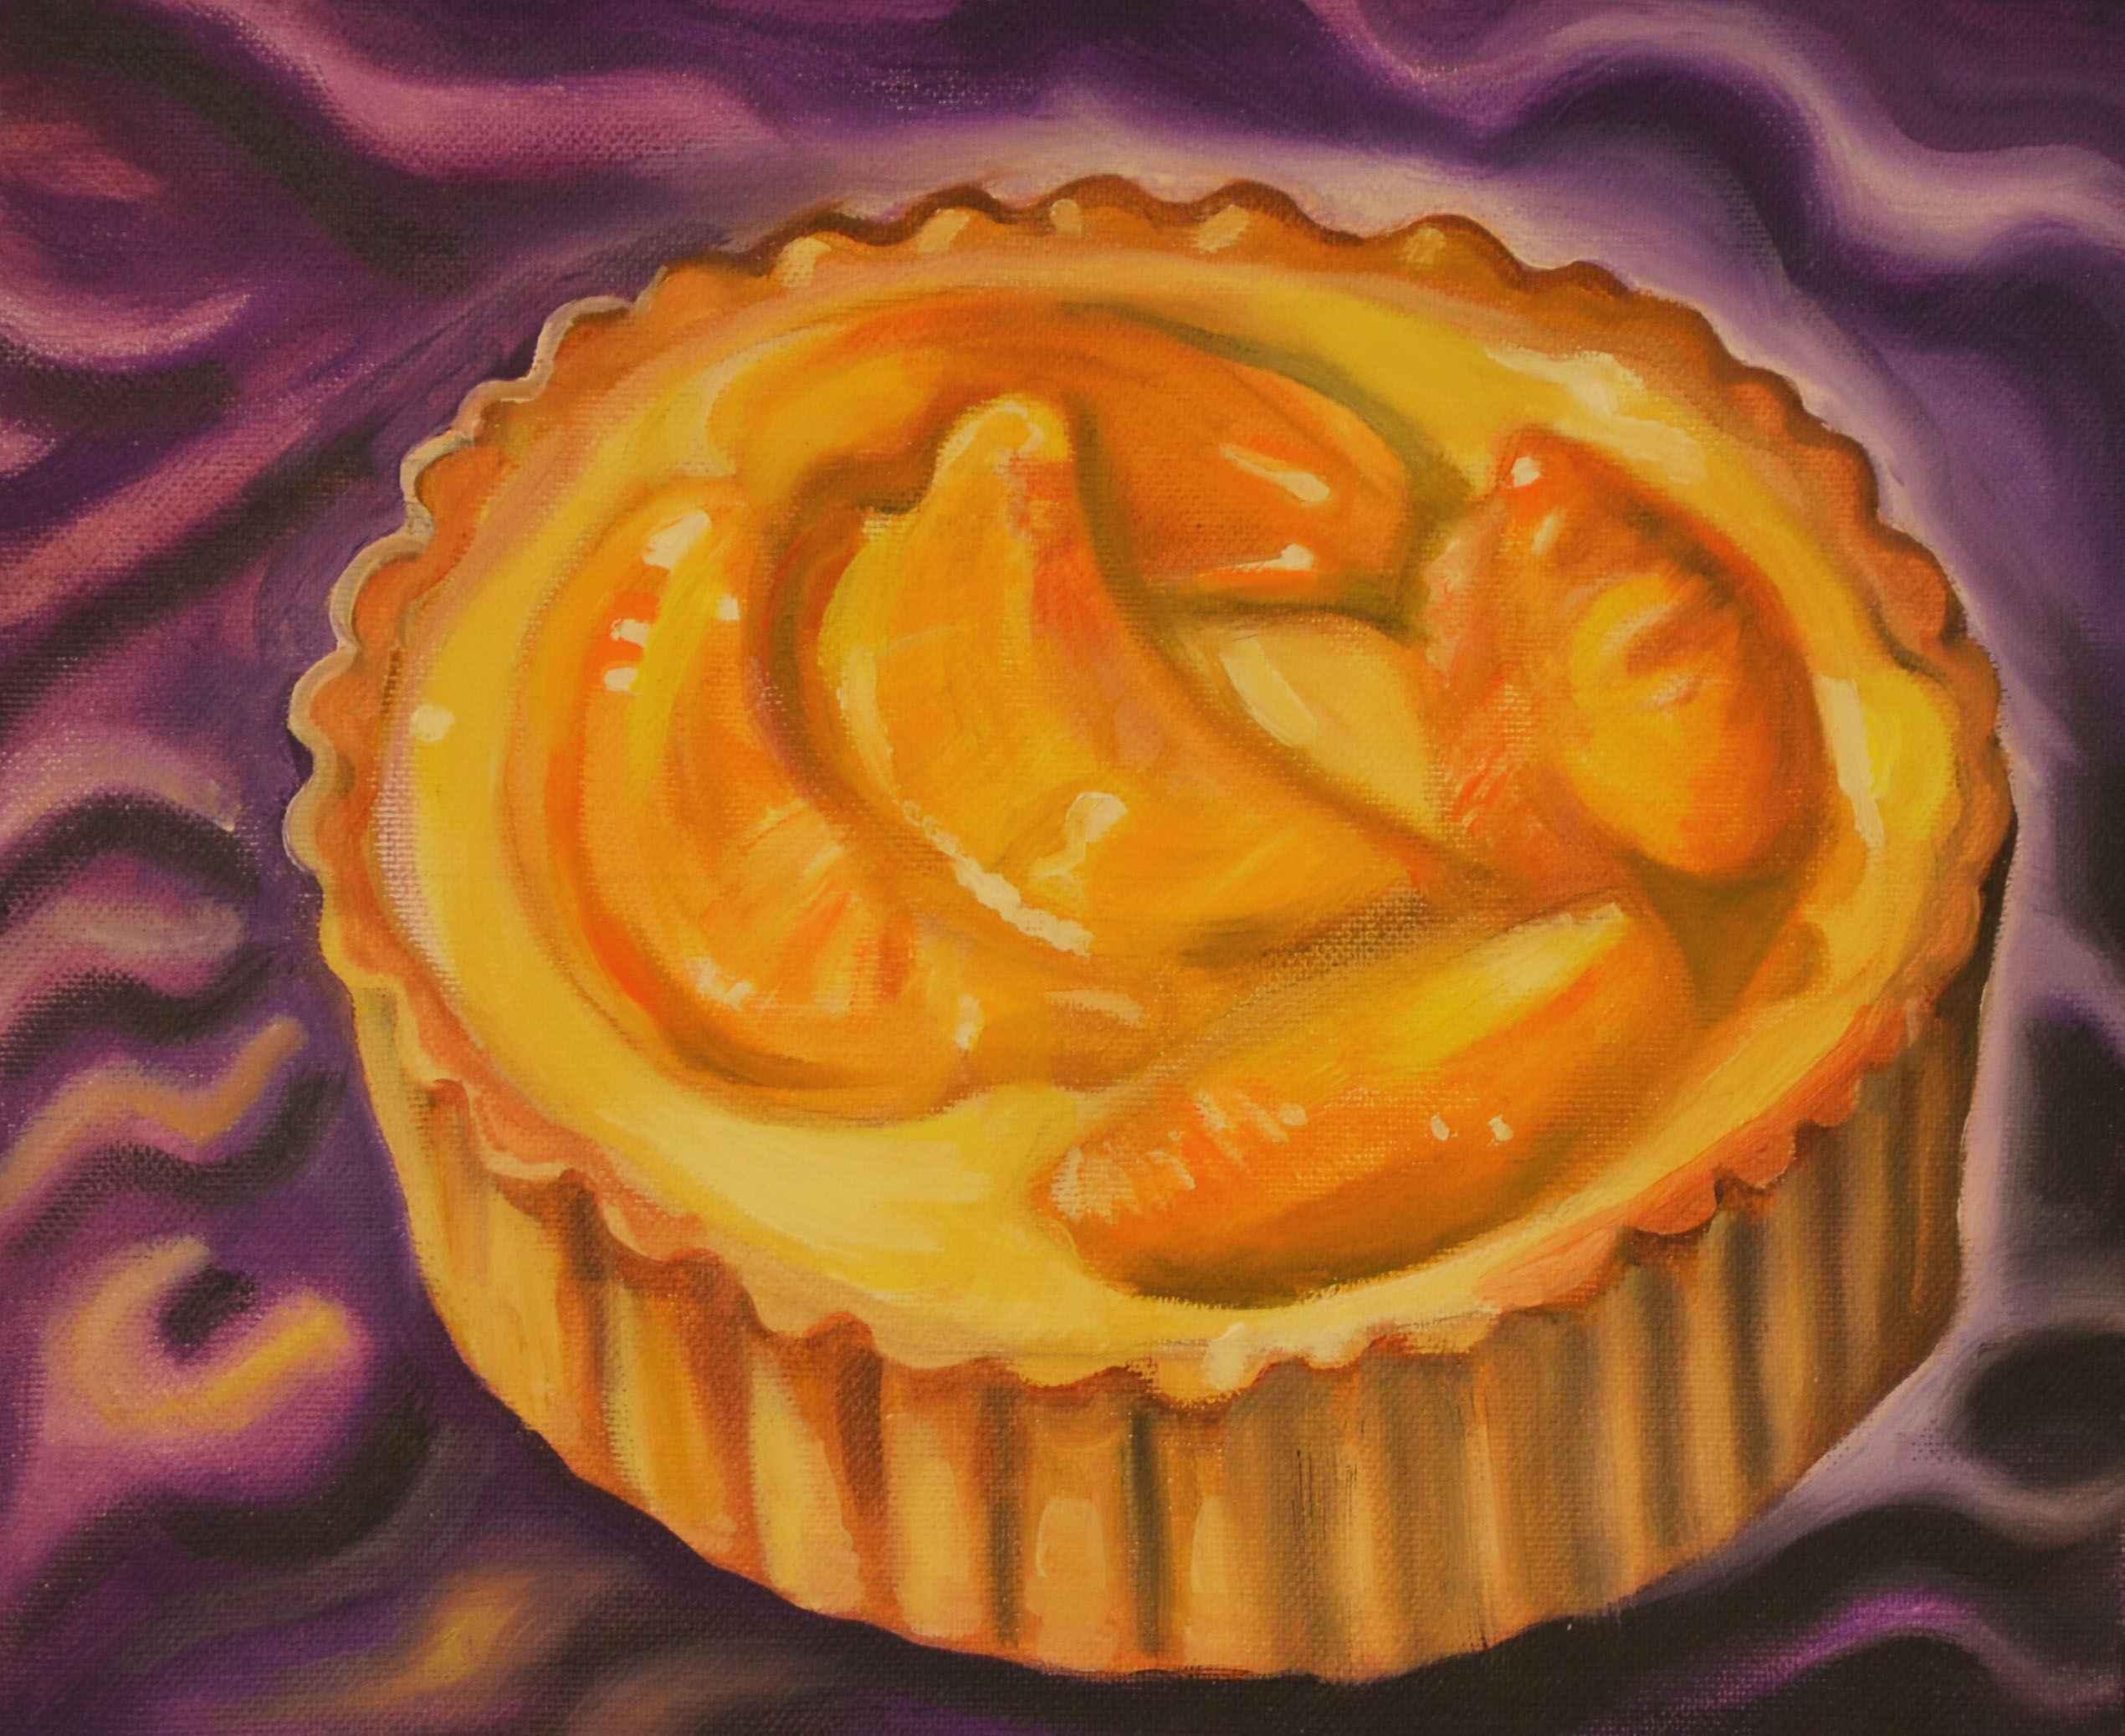 Tarte aux abricots by Ms. Rebecca Vincenzi - Masterpiece Online